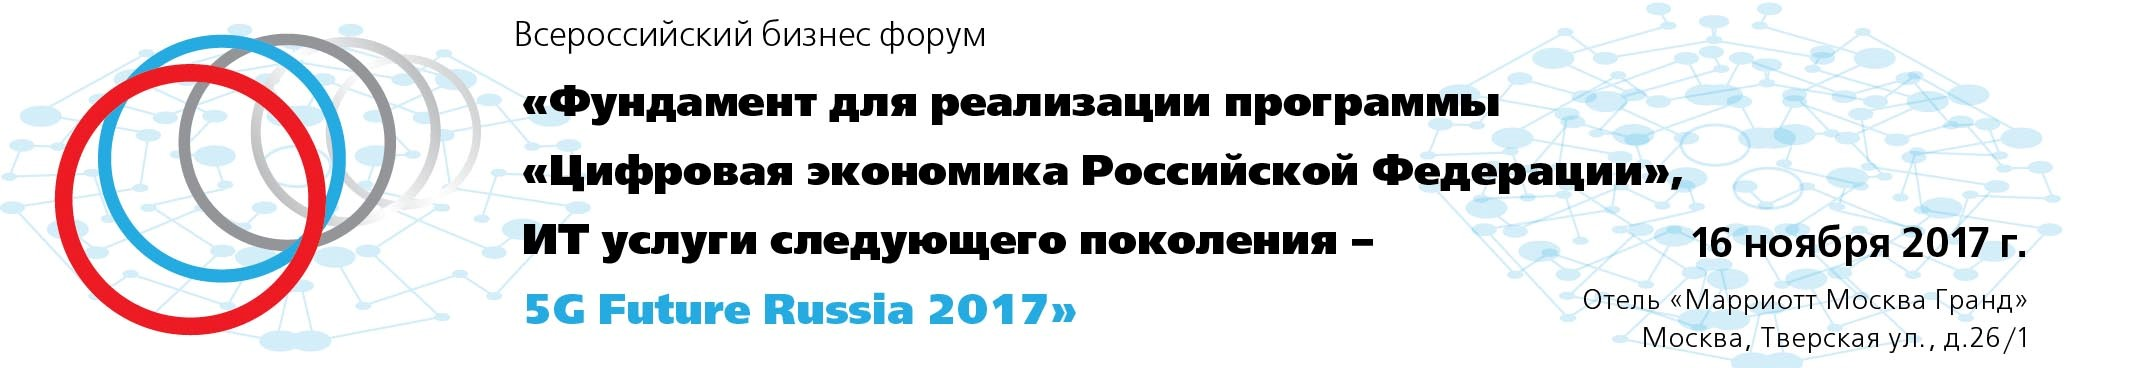 Бизнес-форум «Фундамент для реализации программы «Цифровая экономика РФ – 5G Future Russia 2017»